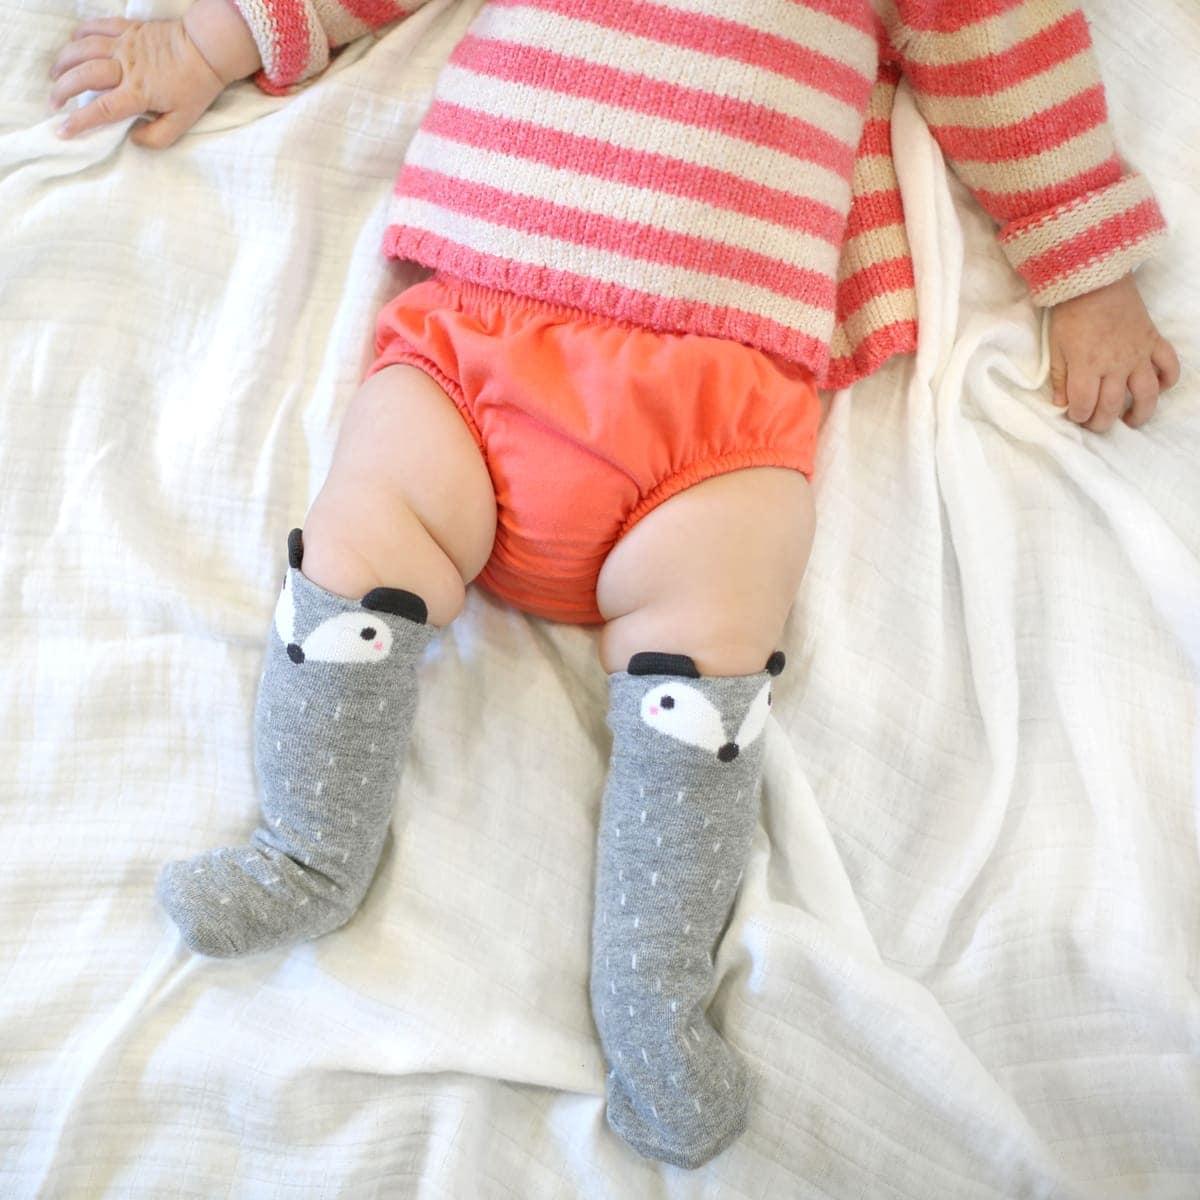 Chubby baby legs